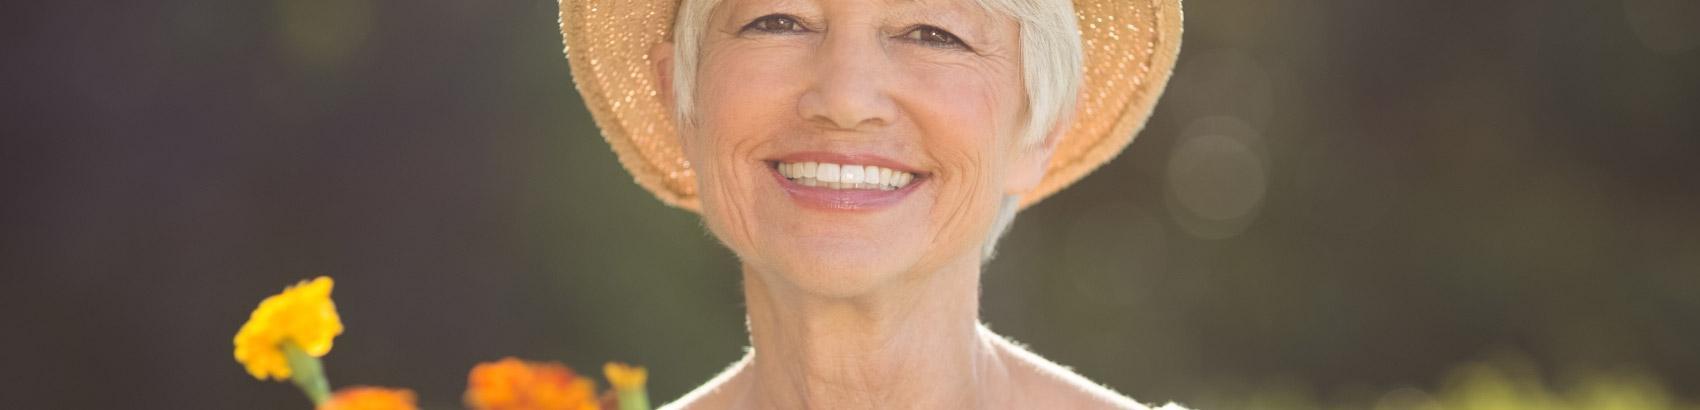 Dental Implants - Asuncion Dental Group